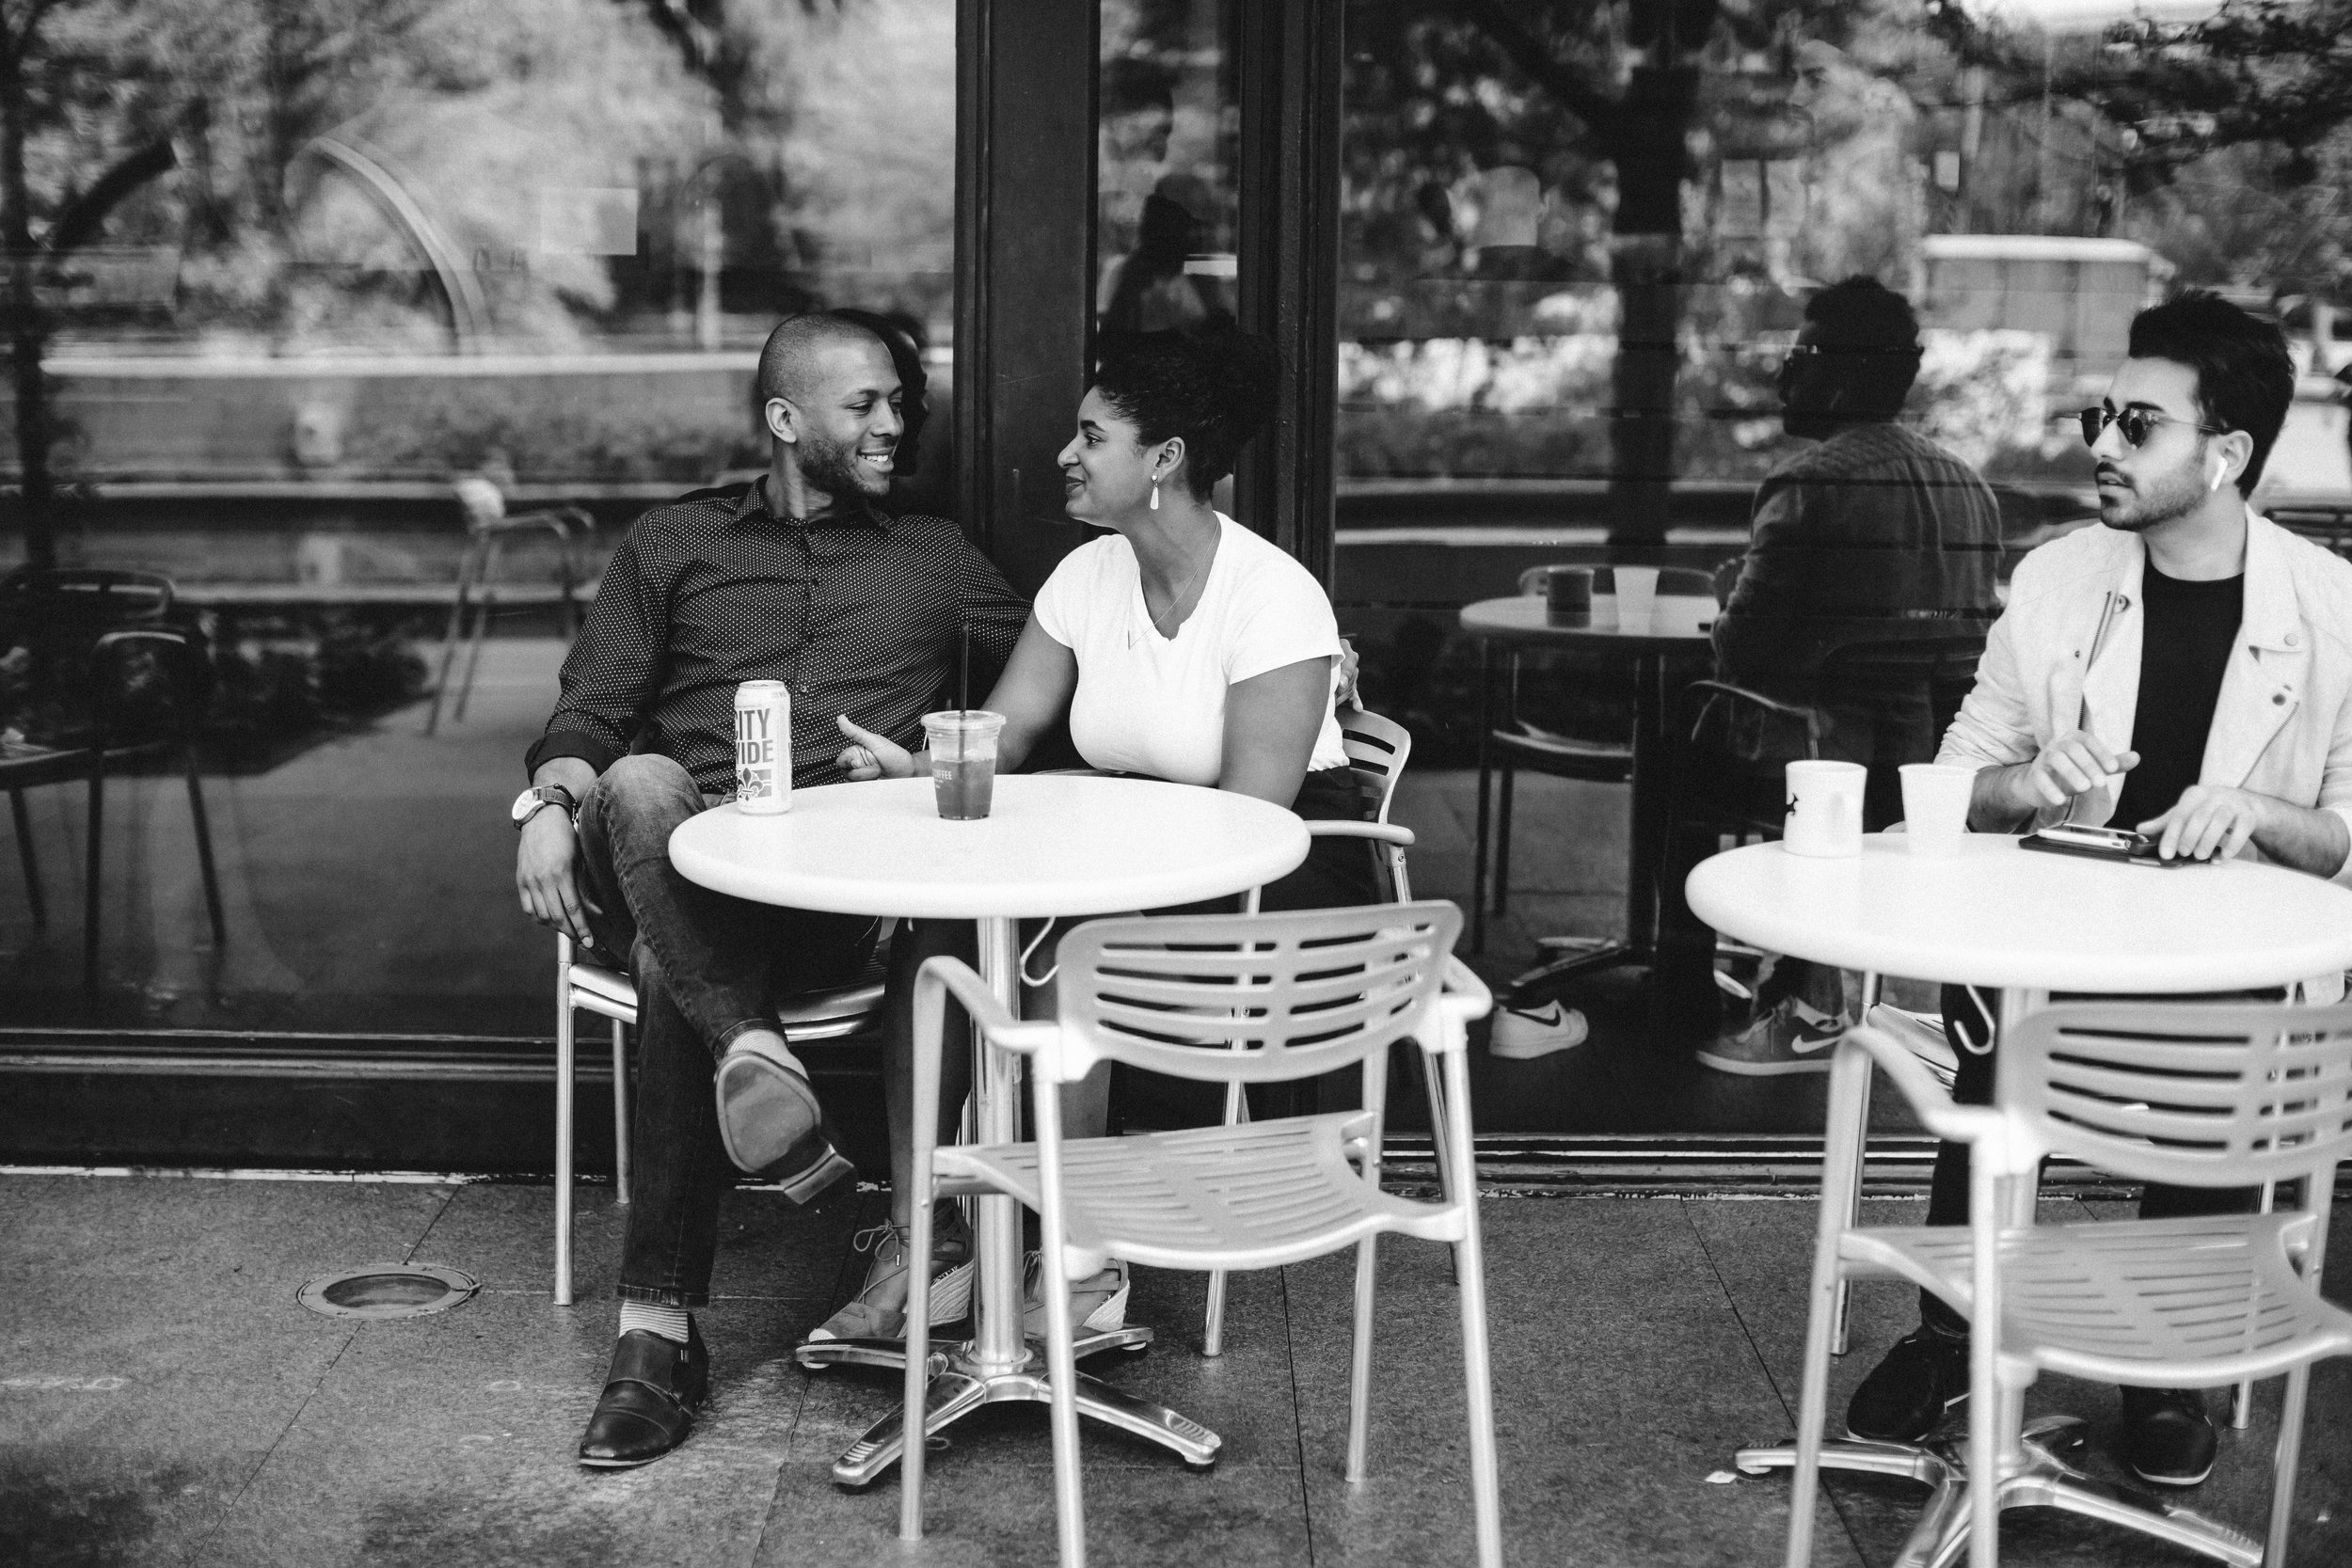 relaxed couple photos, real couple photos, urban couple photos, chicago couple photos, couple photography St. Louis, couple portraits utah, couple laughing photos, couple smiling photos